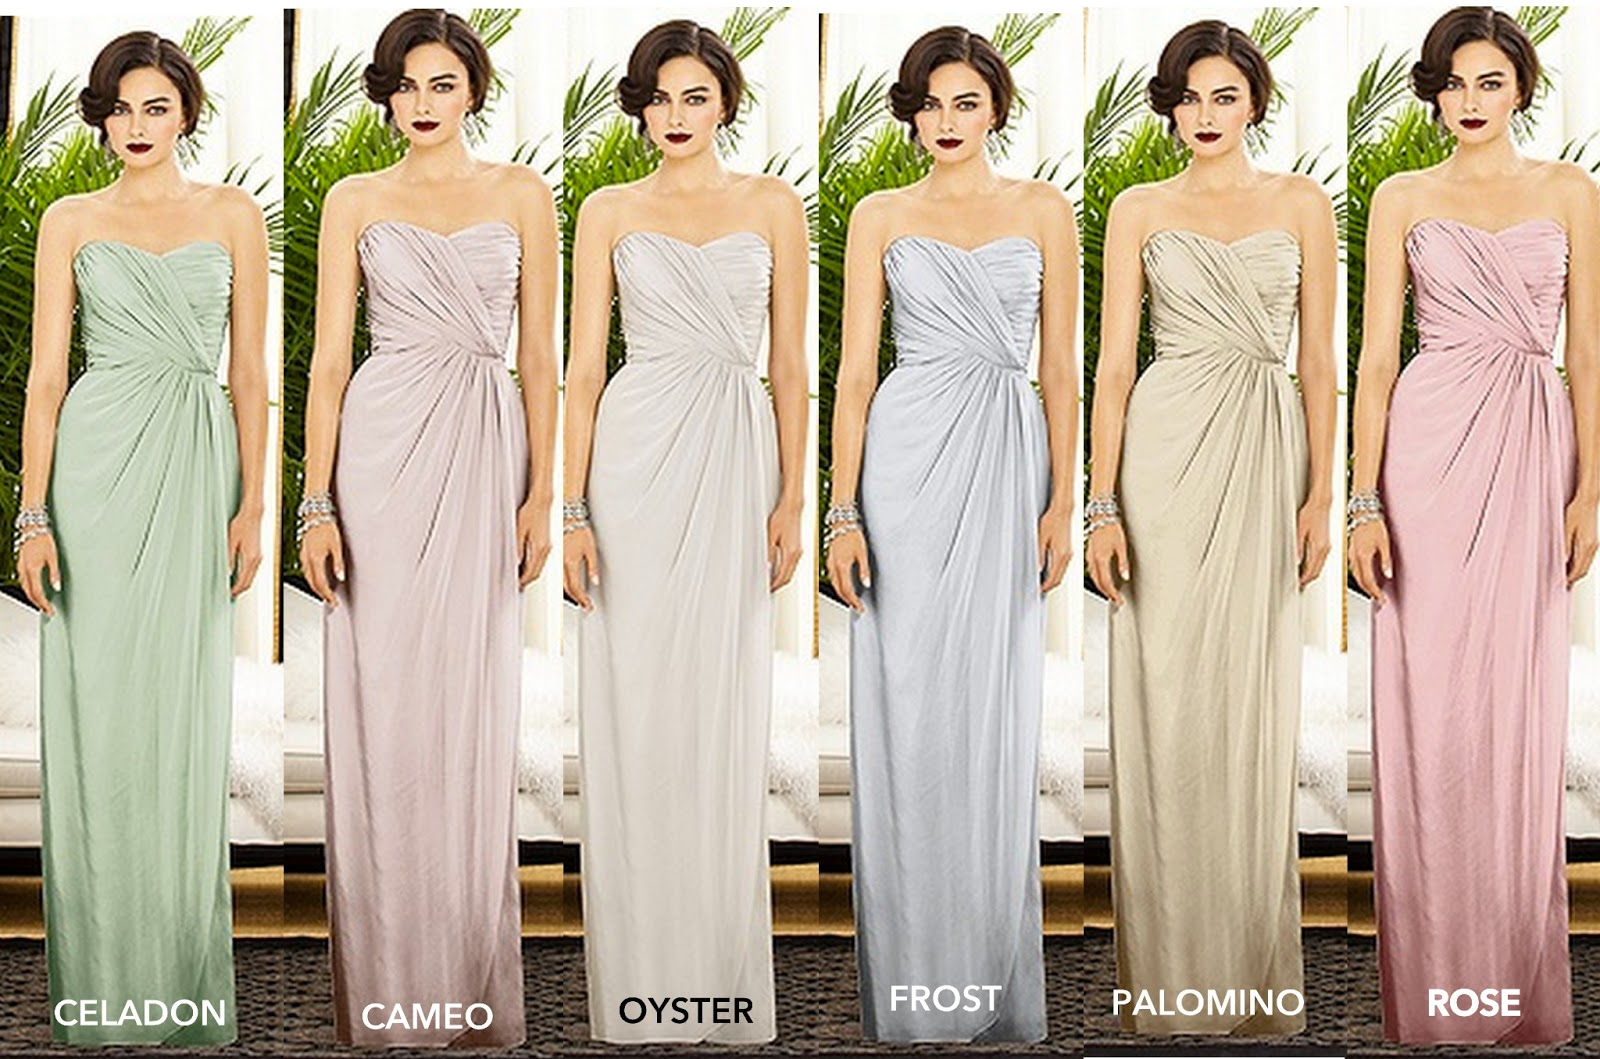 Bridesmaids Dresses 50 Shades Of Neutral